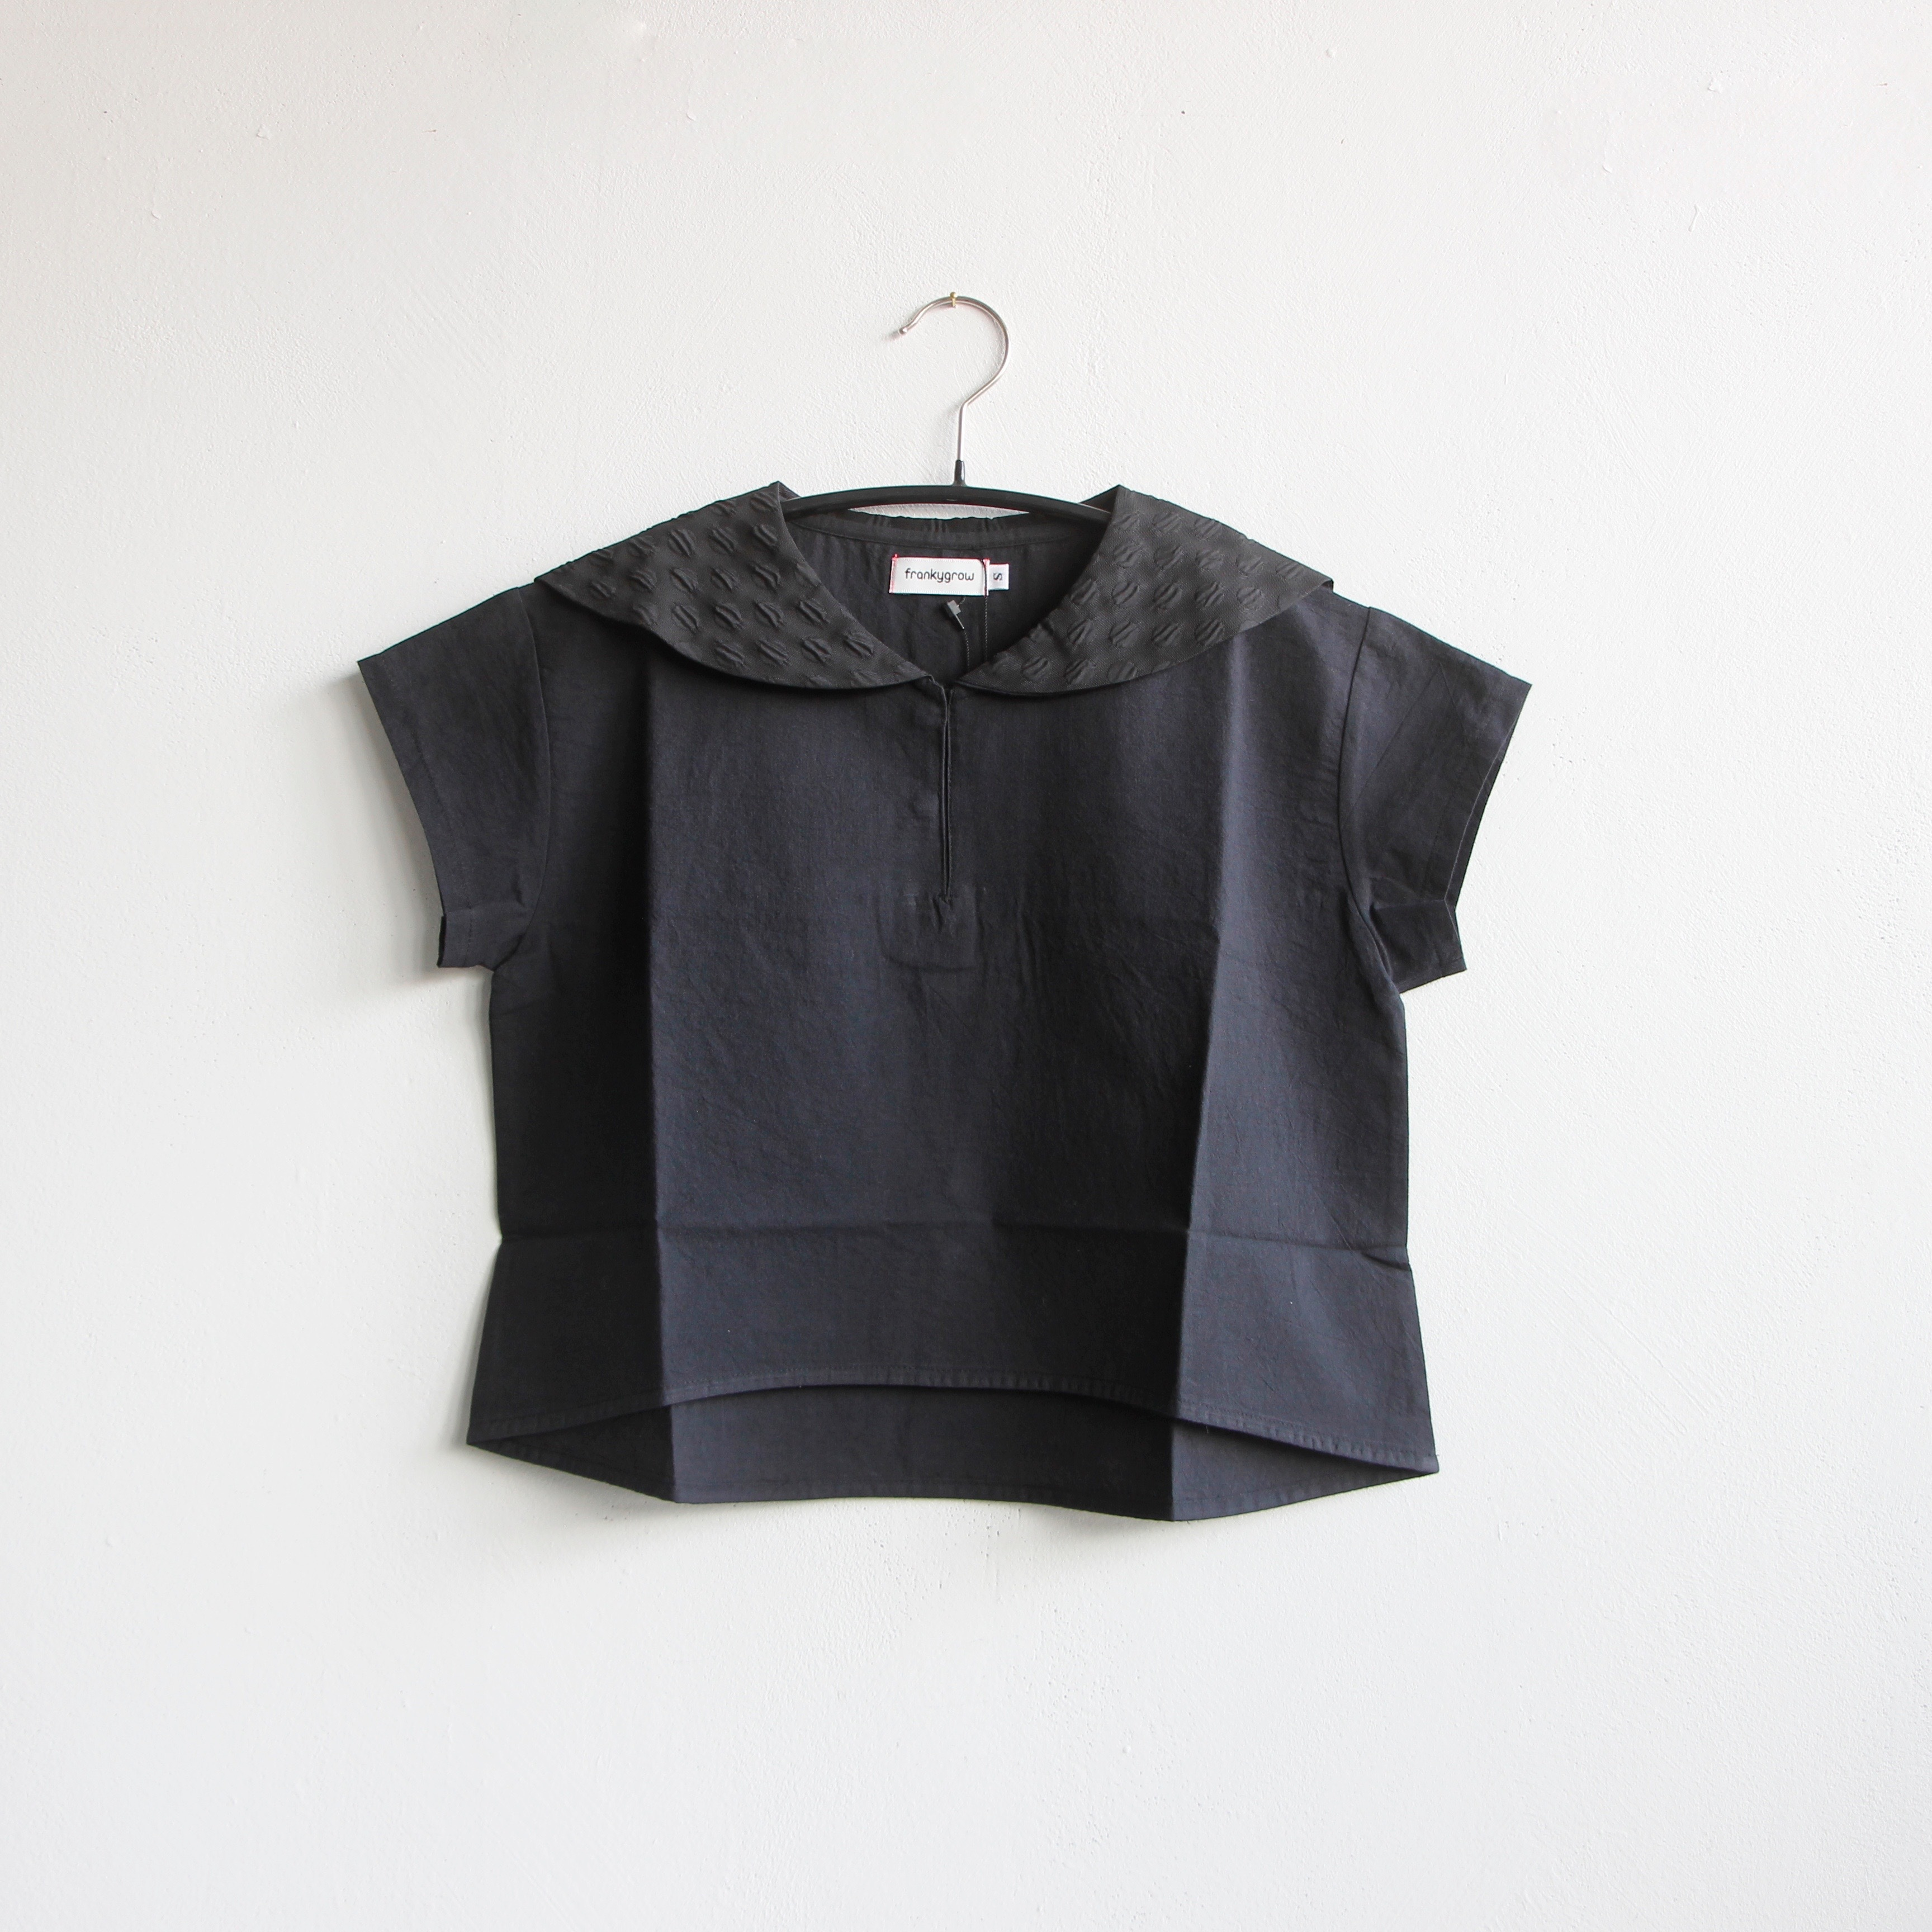 《frankygrow 2020SS》SAILOR COLLAR TP DYED /black / S・M・L